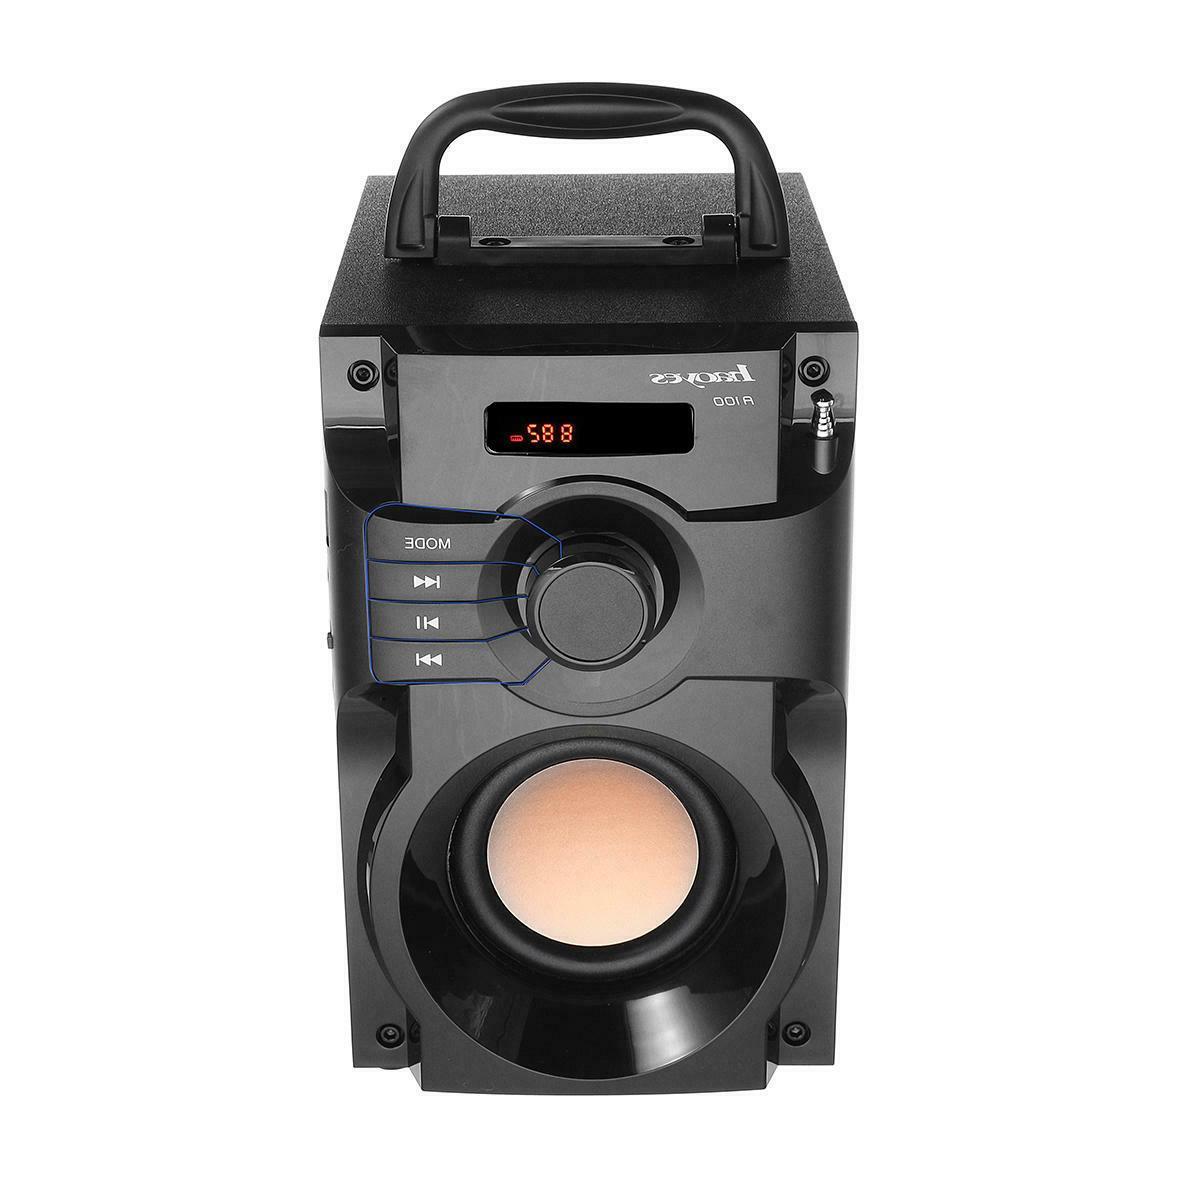 Bass Big Speaker Boombox Sound Box Support